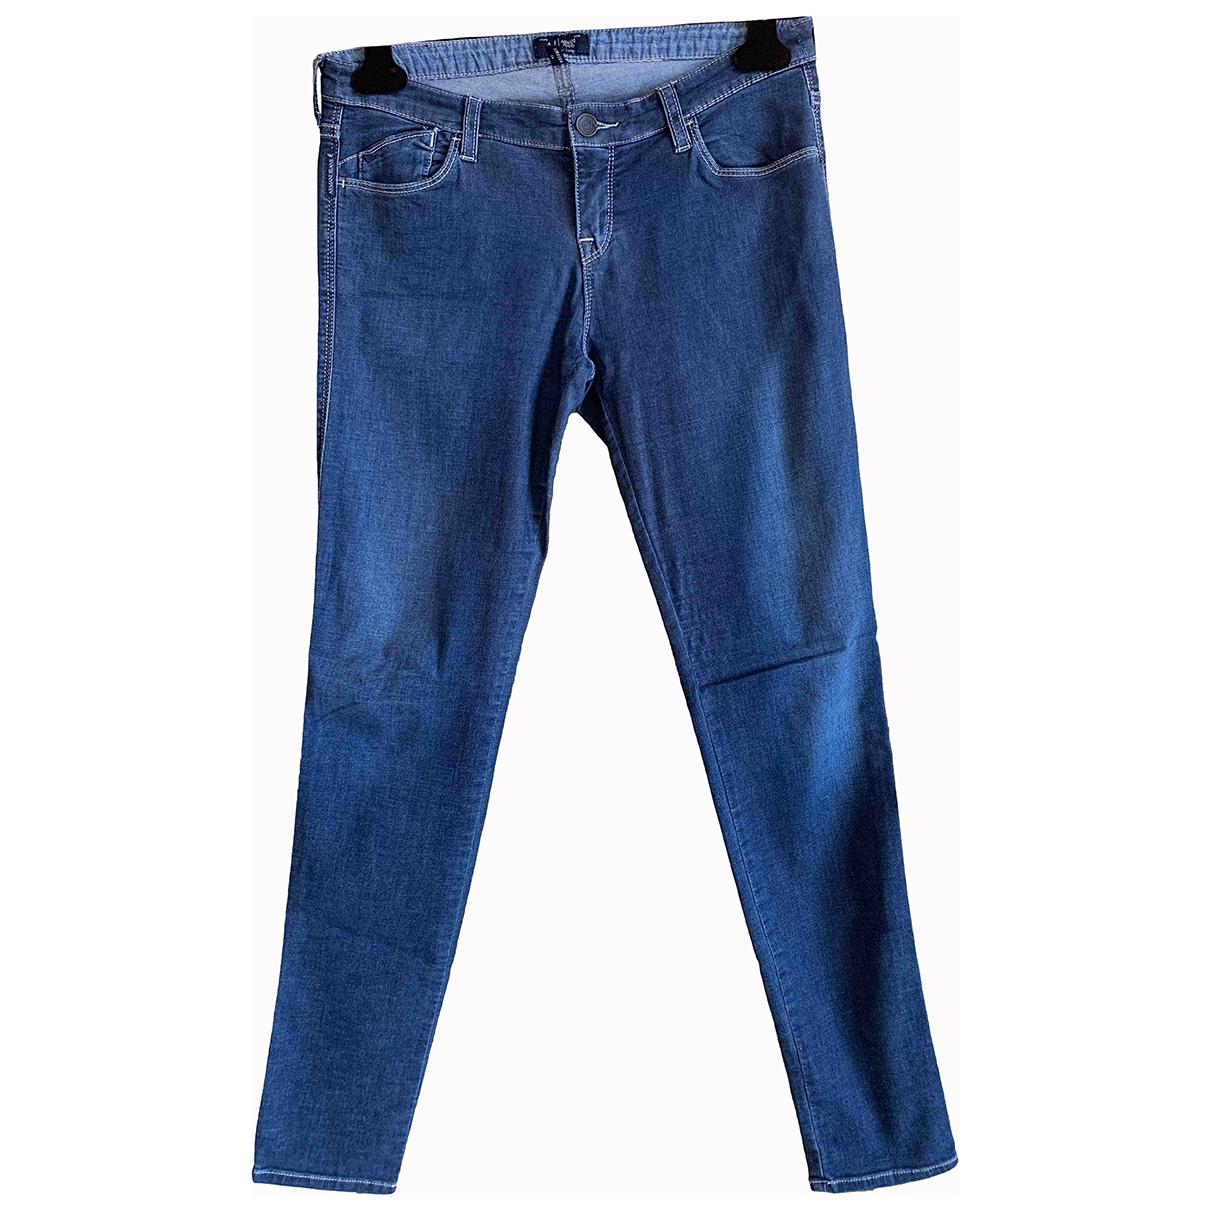 Armani Jeans \N Blue Cotton Jeans for Women 28 US